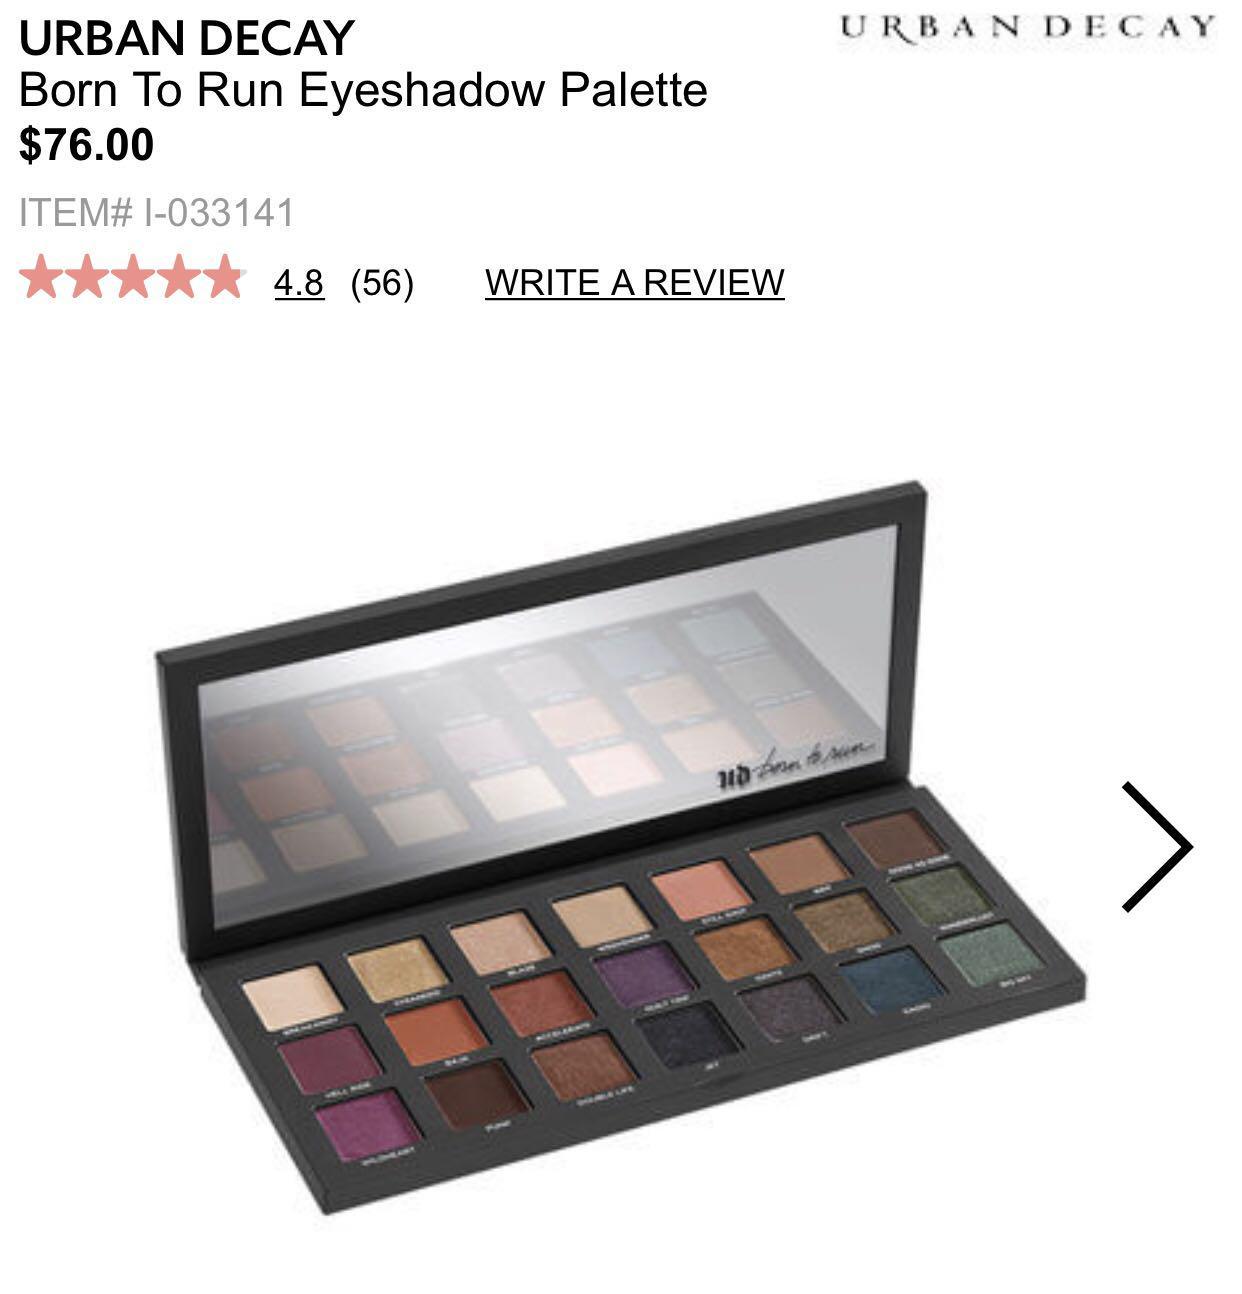 Born to run eyeshadow palette